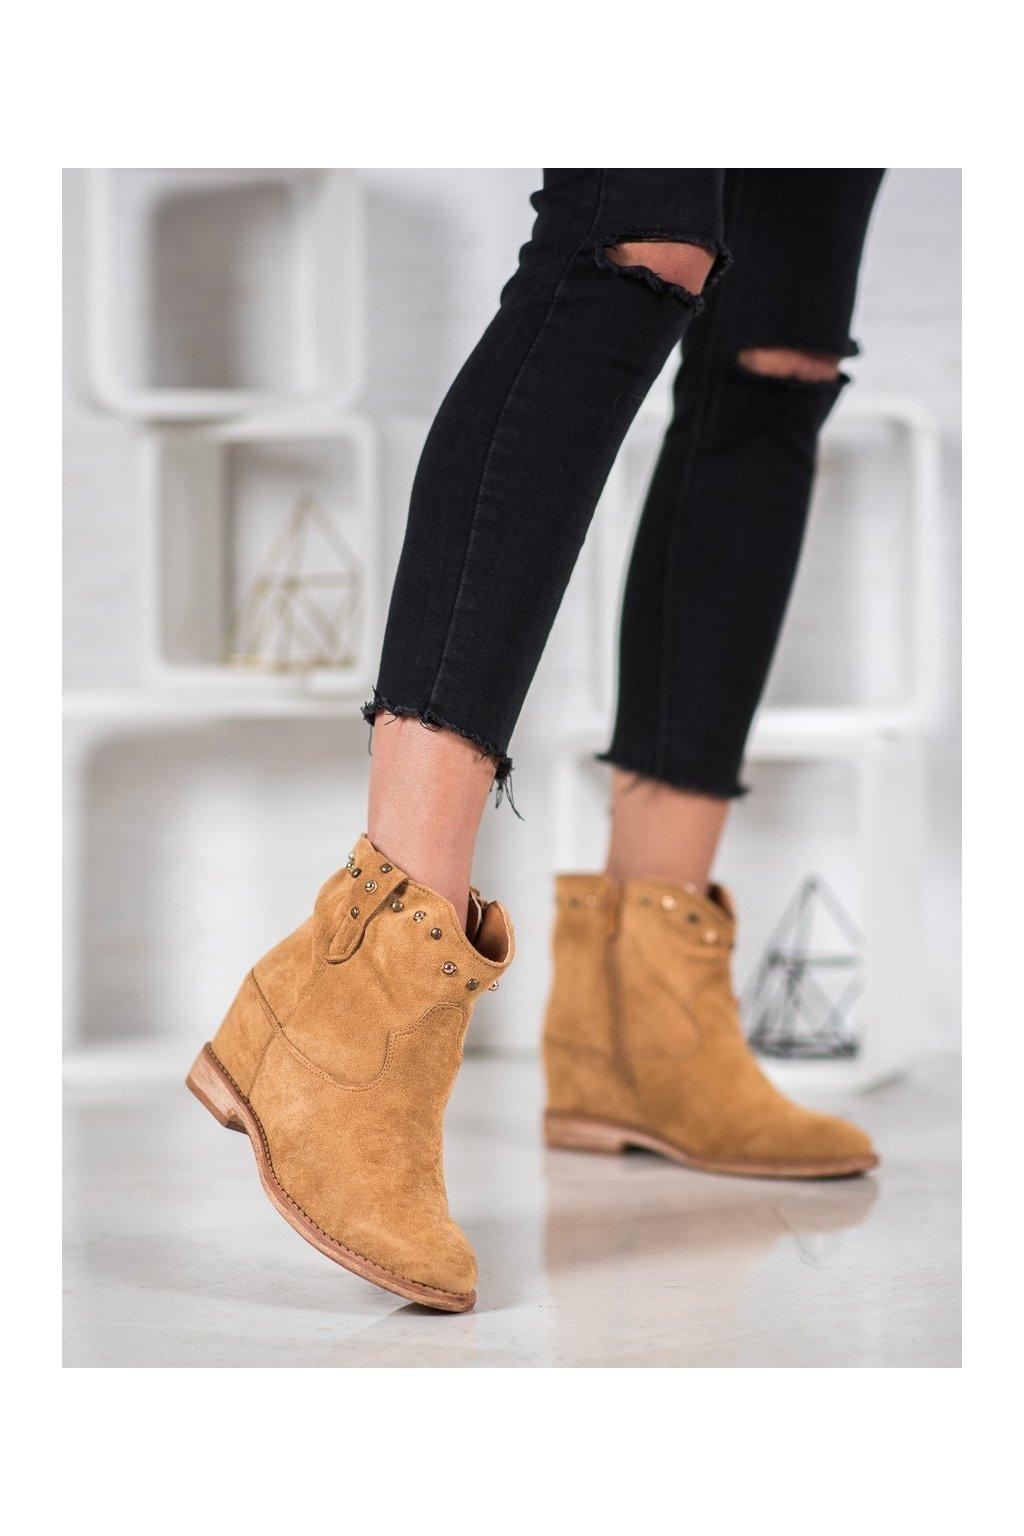 Hnedé dámske topánky Bella paris kod A3710C